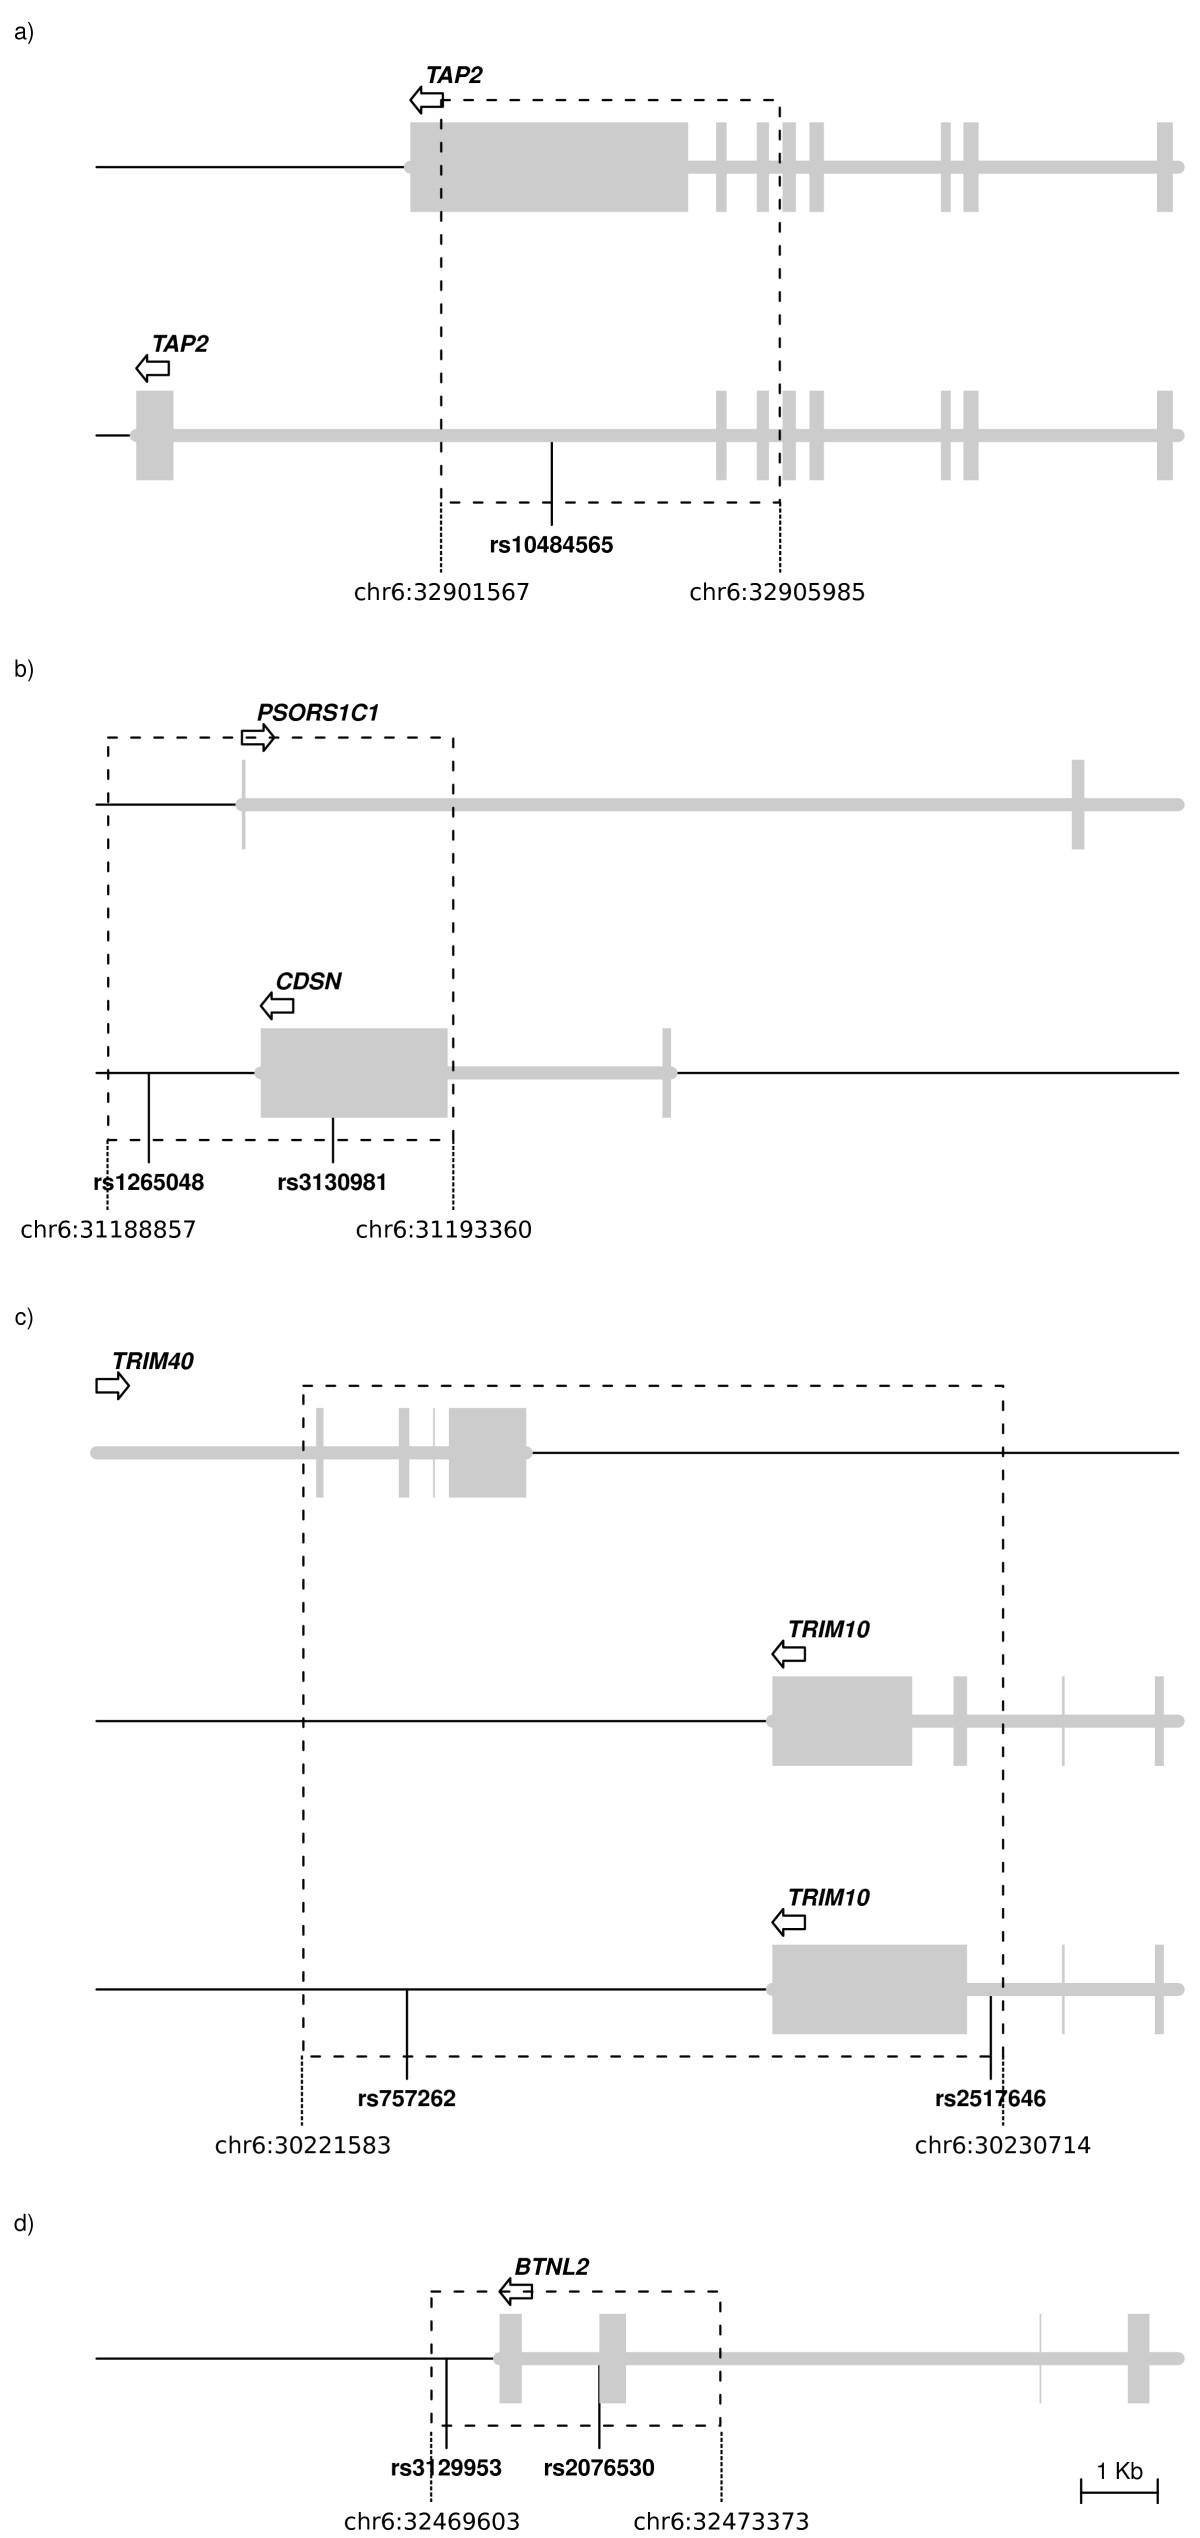 https://static-content.springer.com/image/art%3A10.1186%2F1471-2148-11-171/MediaObjects/12862_2011_1776_Fig2_HTML.jpg